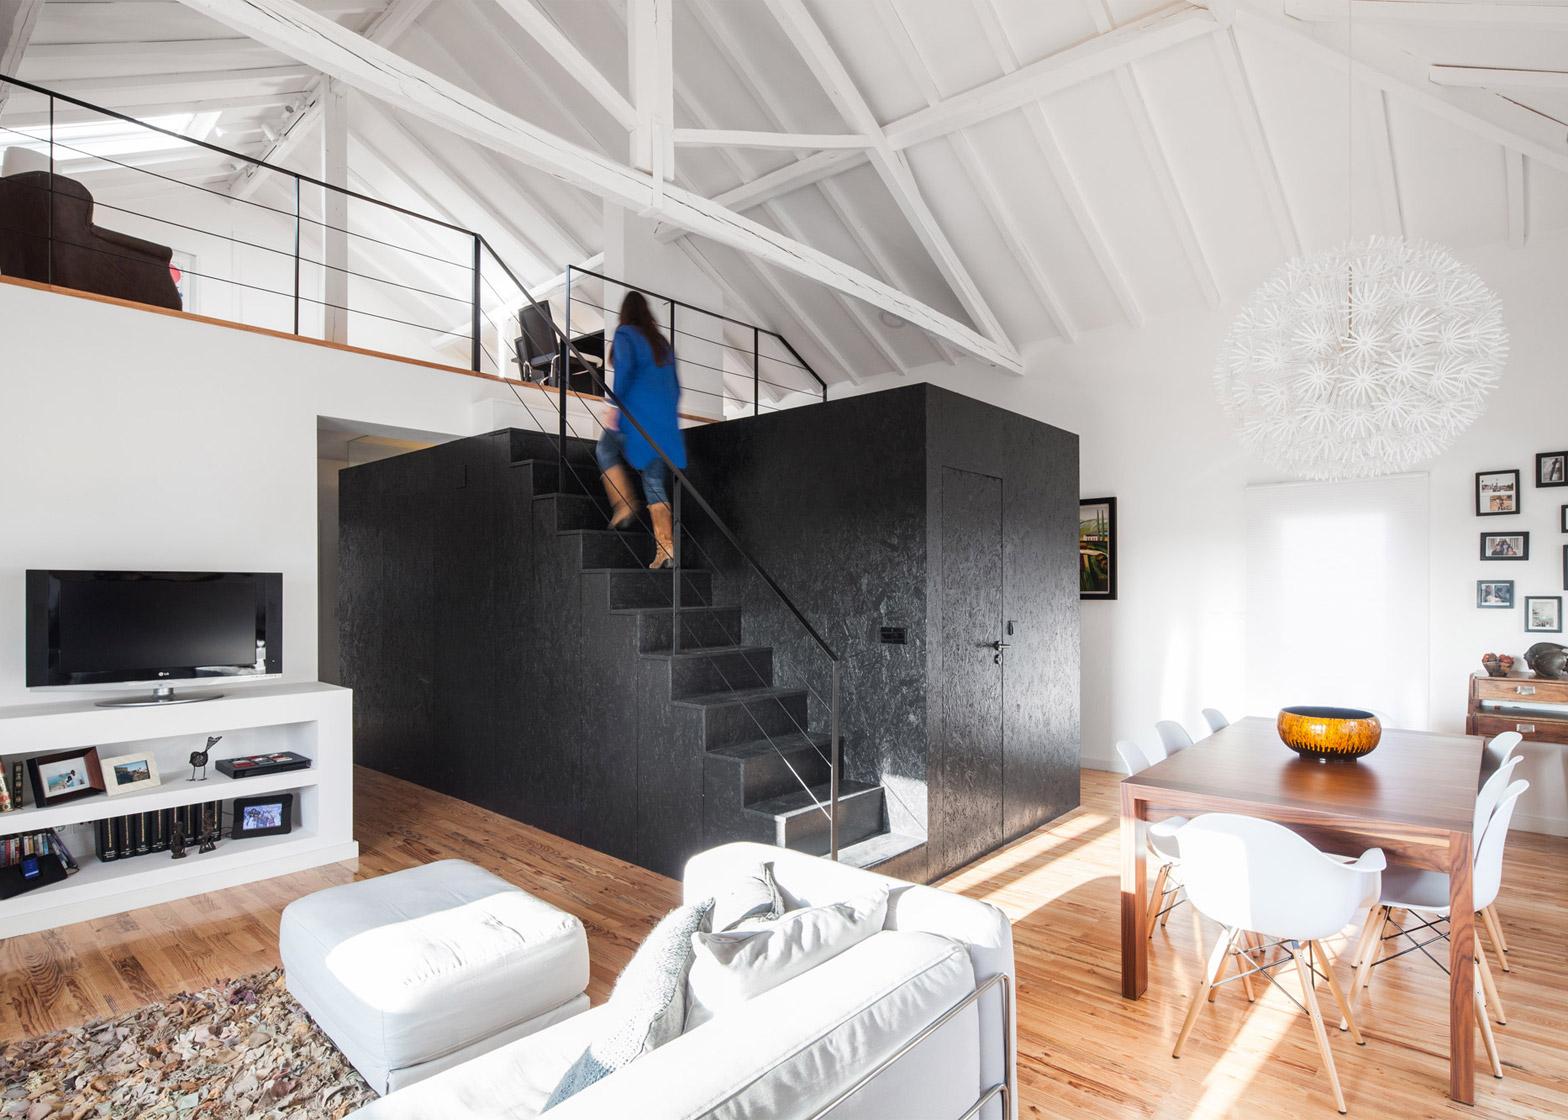 Barn-House_Monte-Real_Ines-Brandao_dezeen